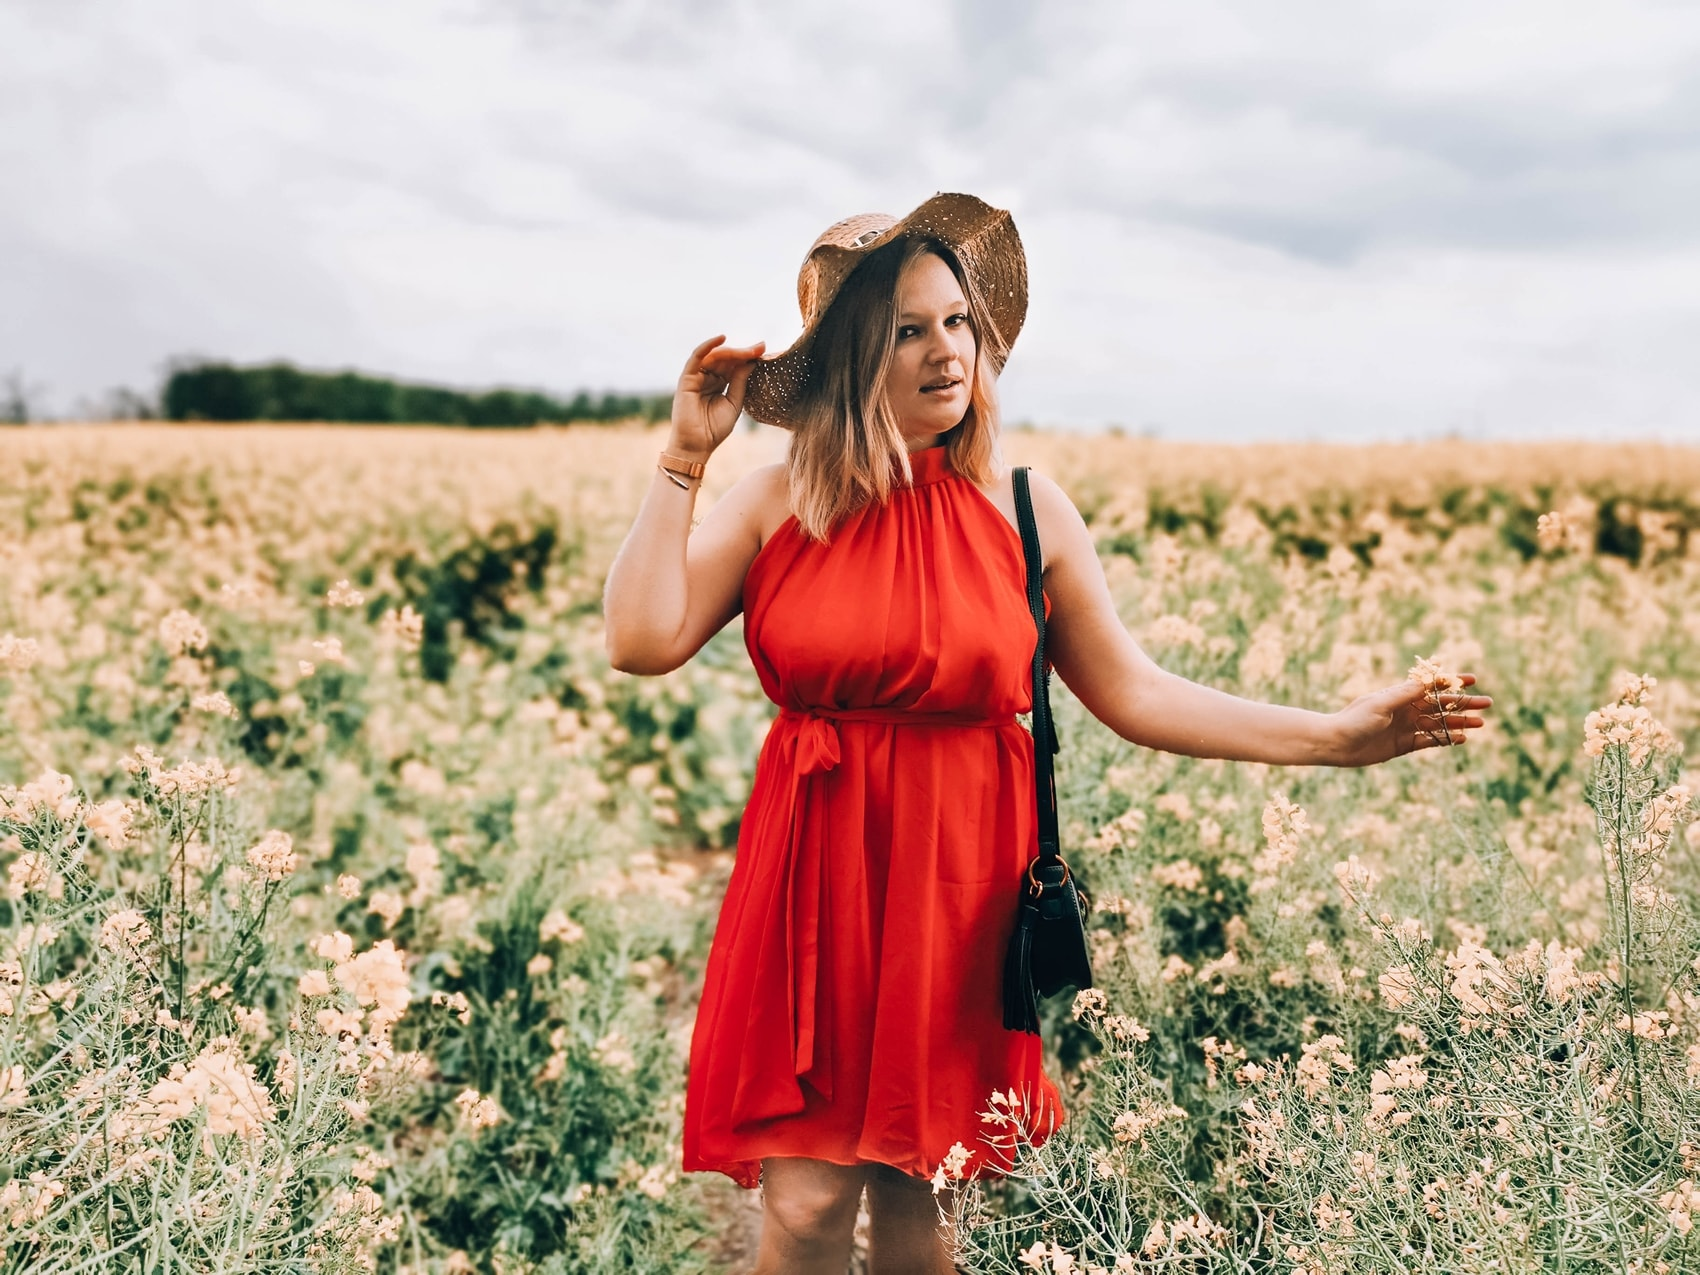 sukienka-czerwona_sensistore